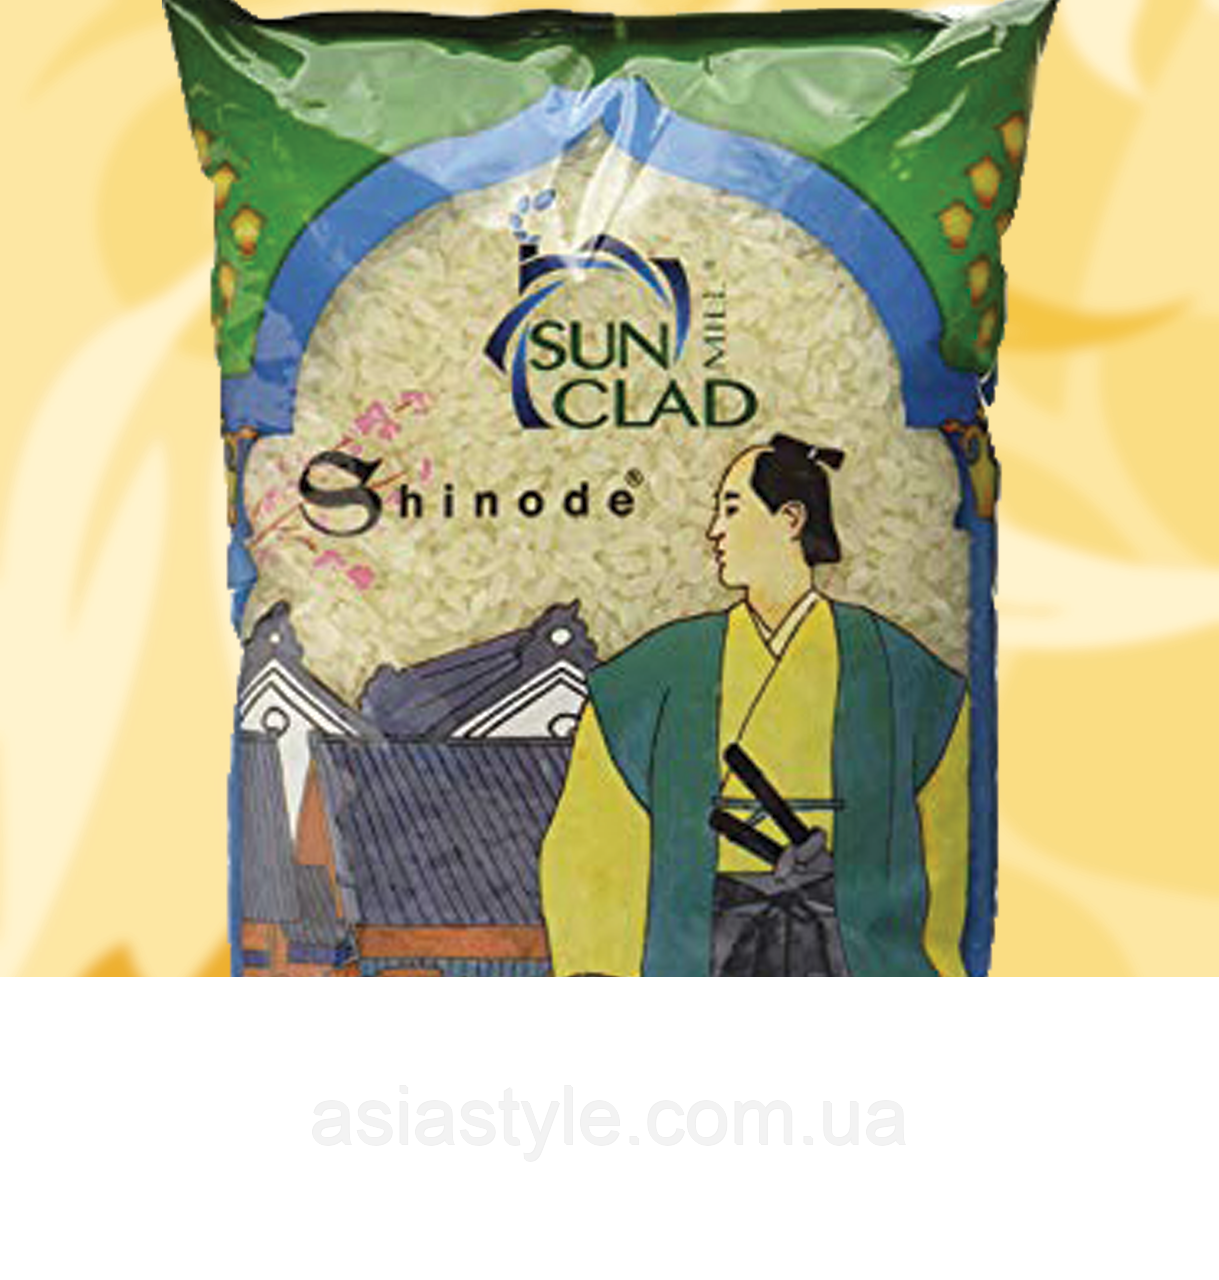 Рис японський, Sun Clad, Japanese Shinode Rice, 1кг, Дж